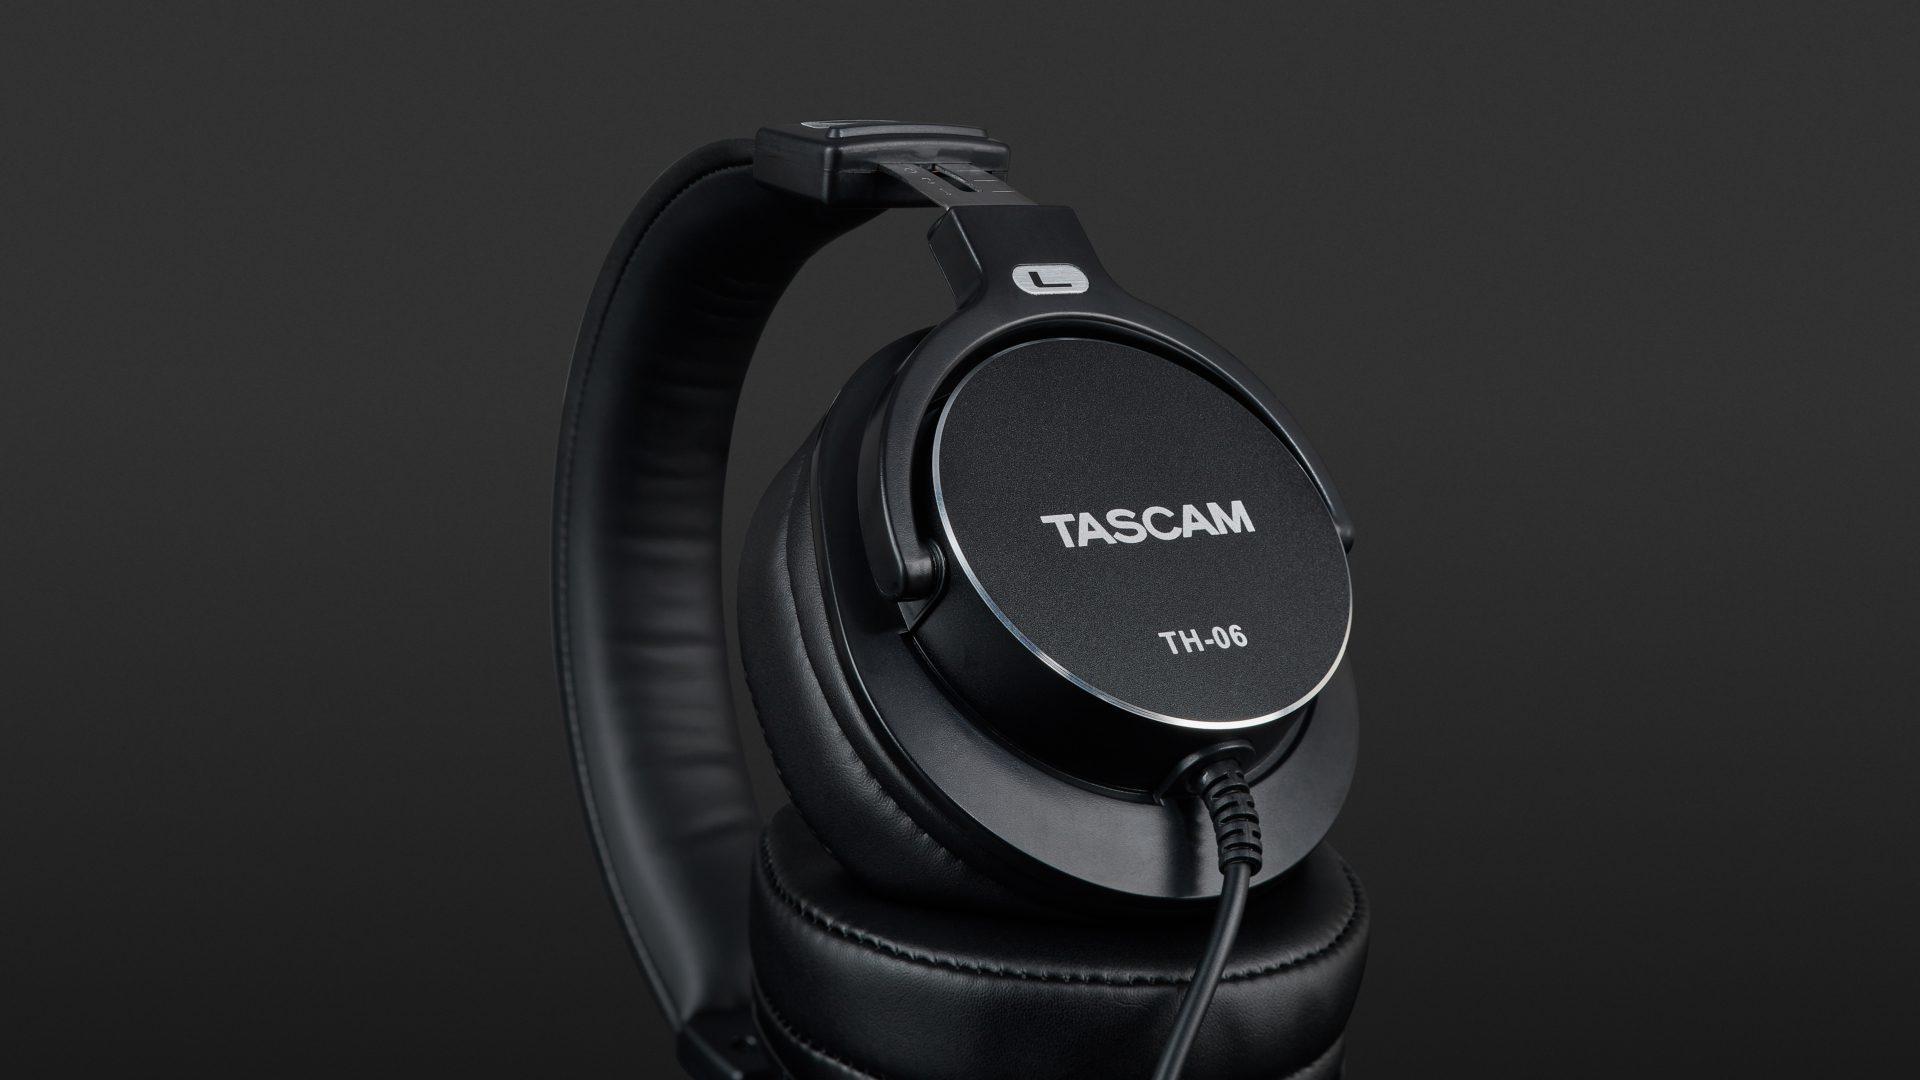 Tascam TH-06